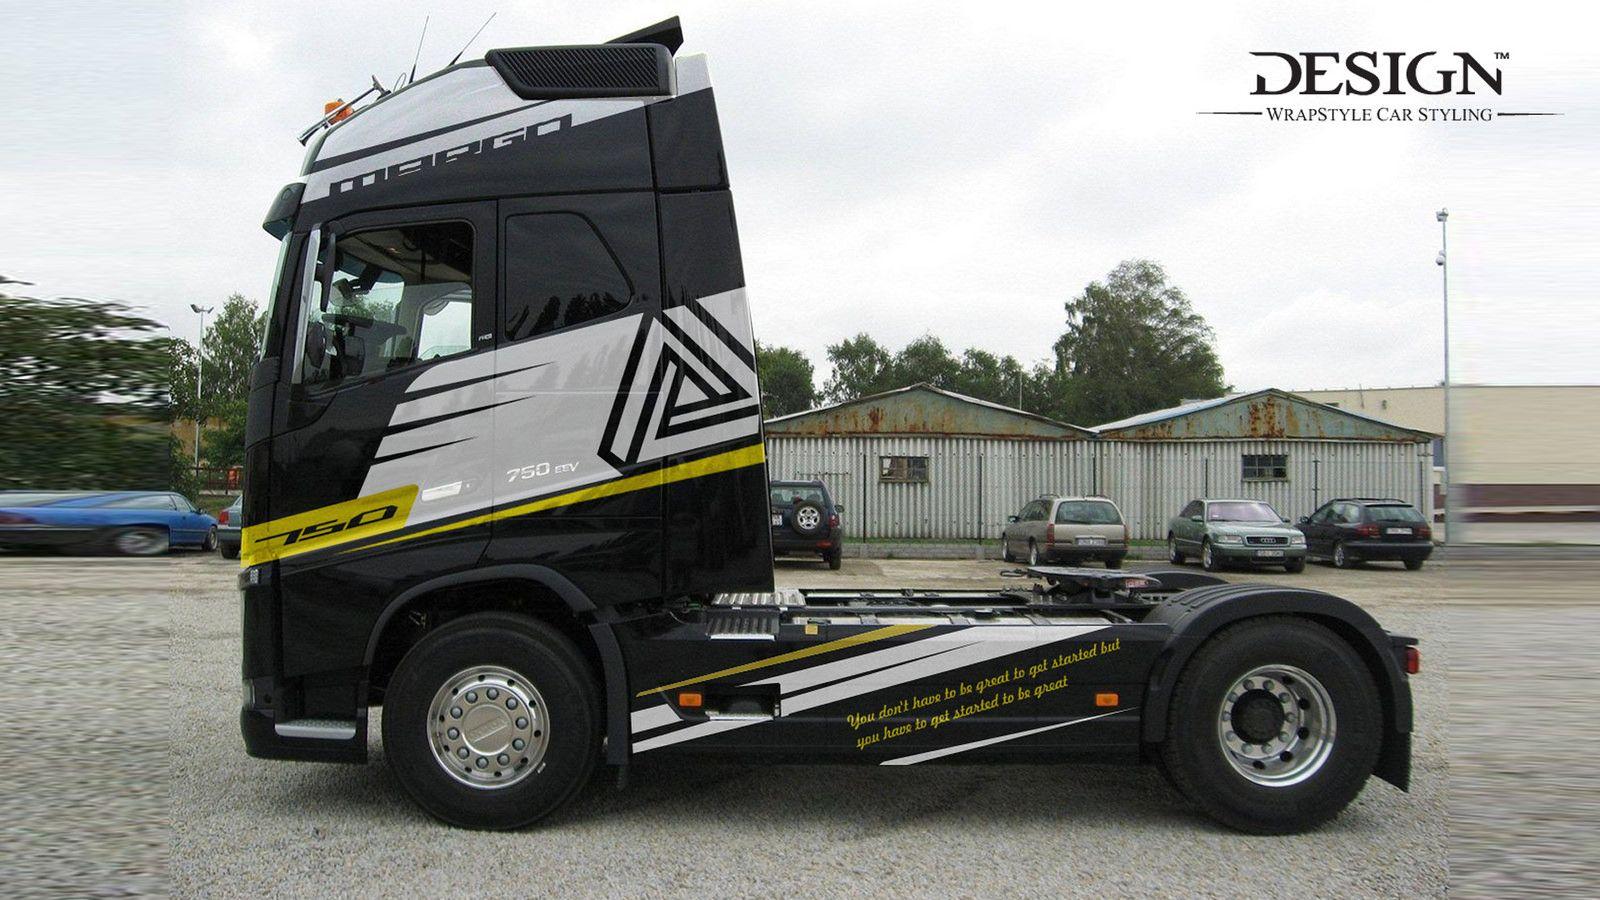 Volvo 750 03 Vehicle signage, Volvo trucks, Volvo